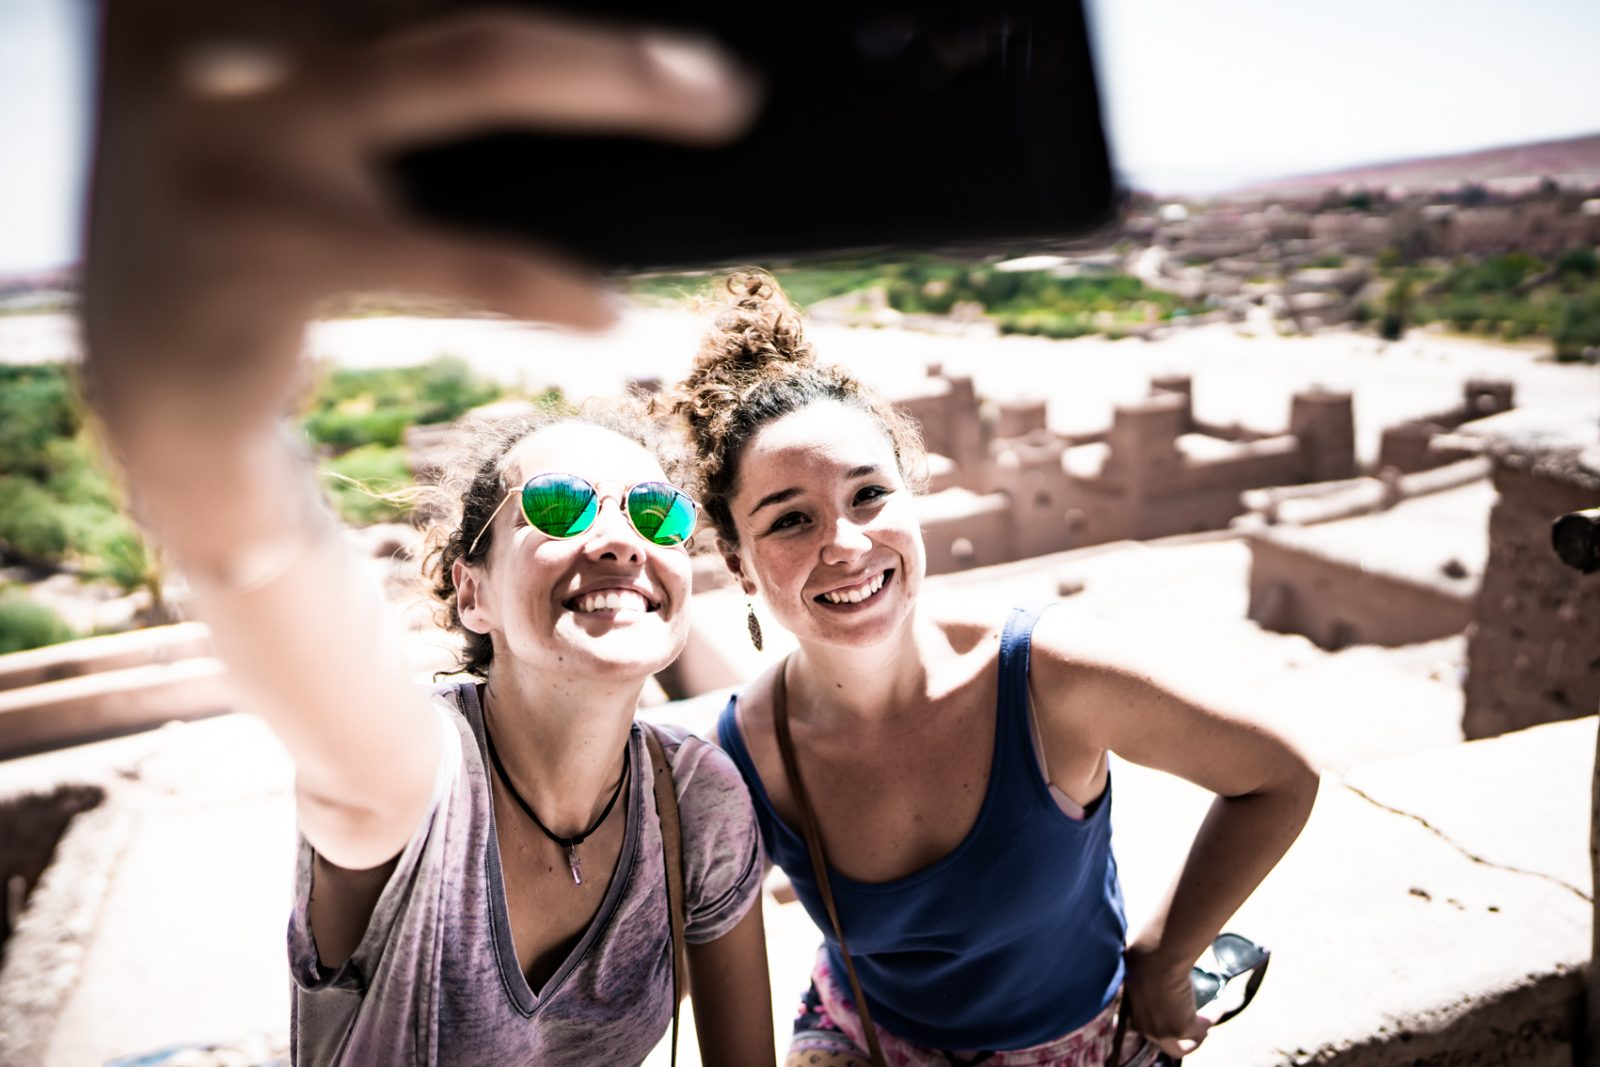 Selfies in morocco